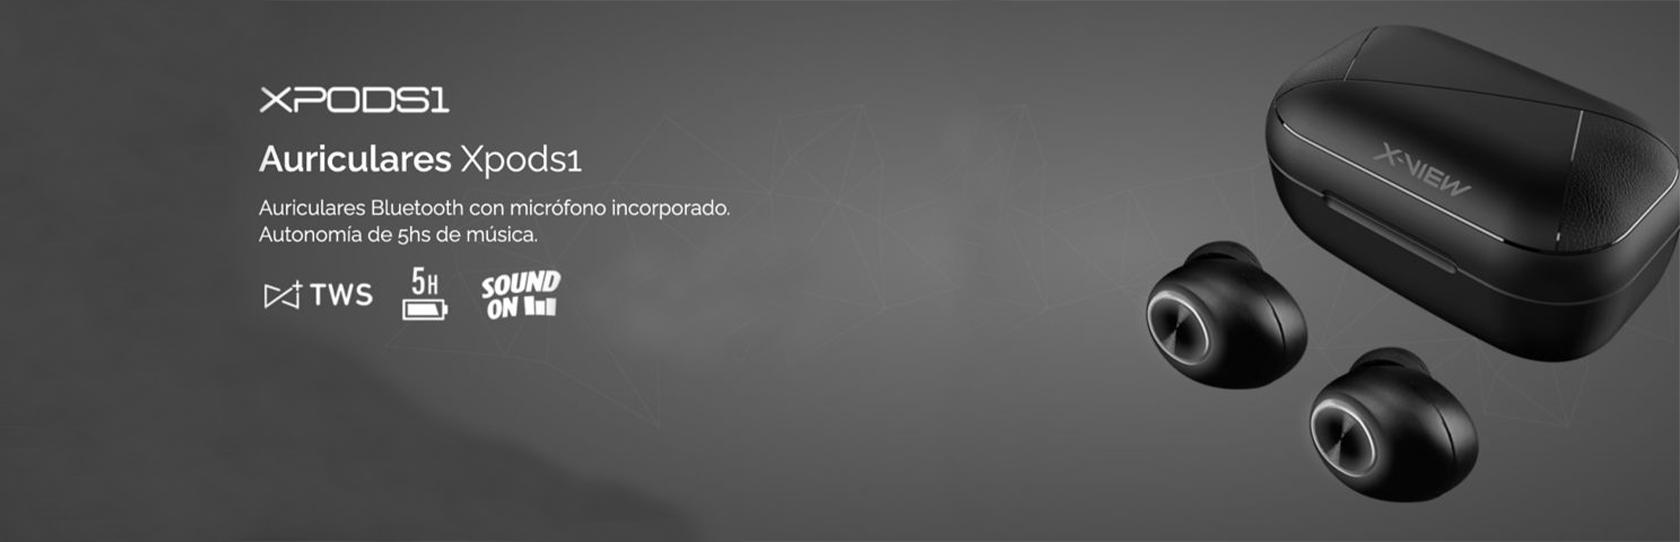 Auriculares Inalámbricos Bluetooth X-view Xpods1